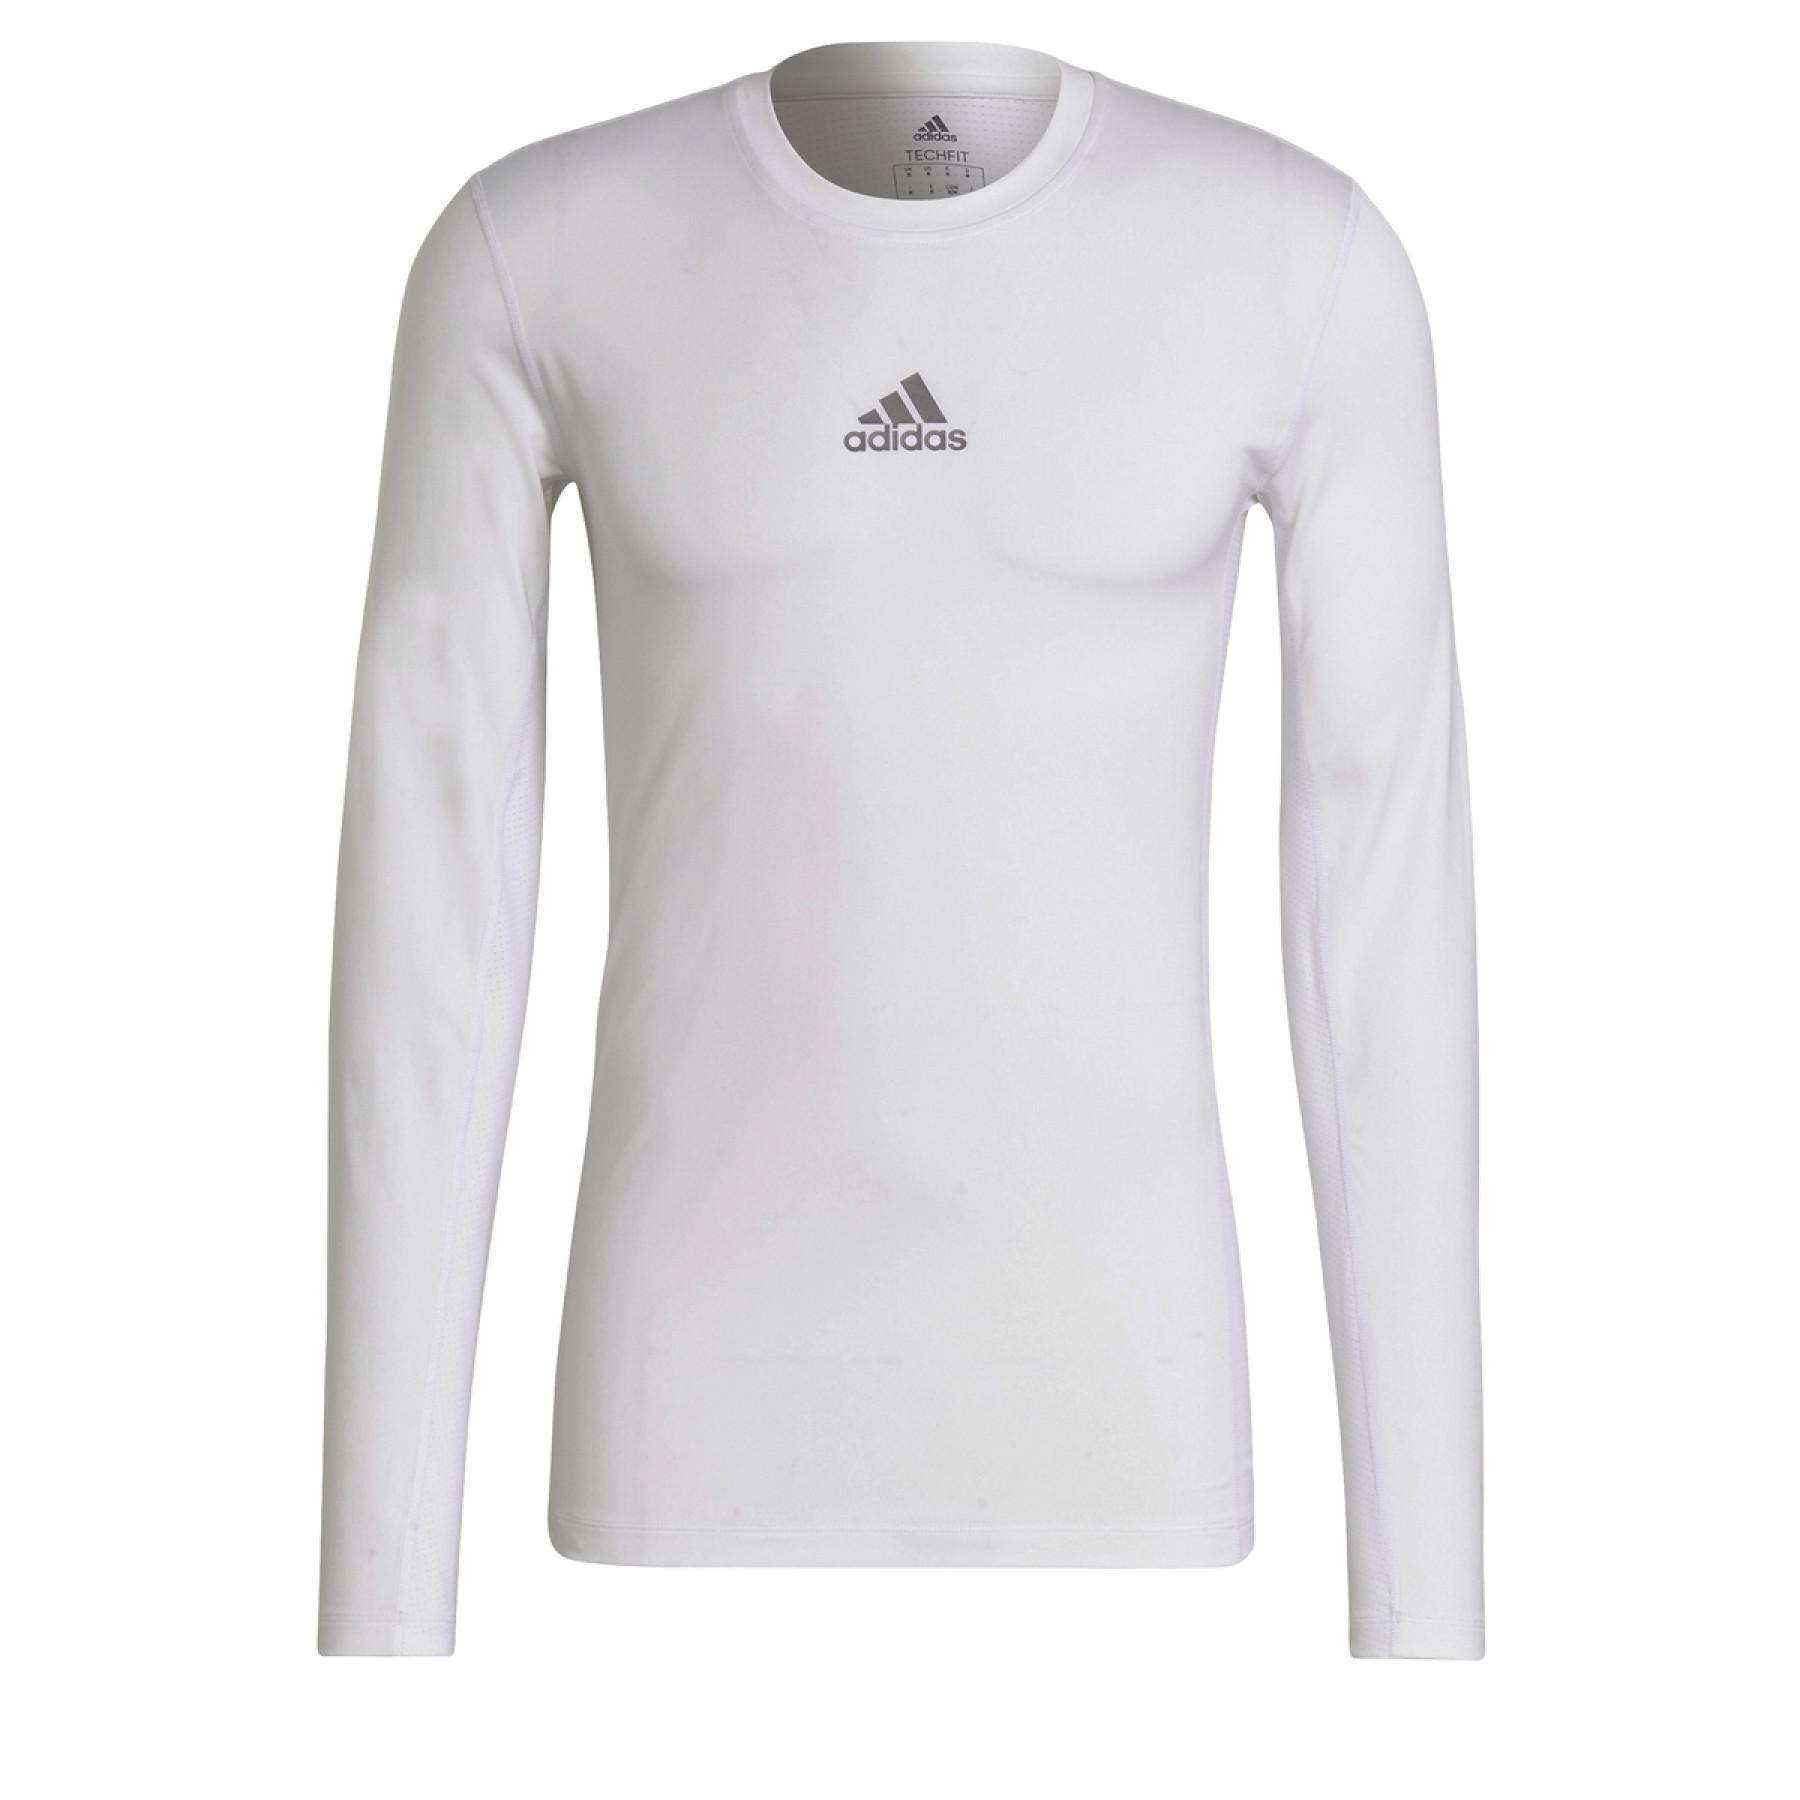 adidas Techfit Long Sleeve T-Shirt